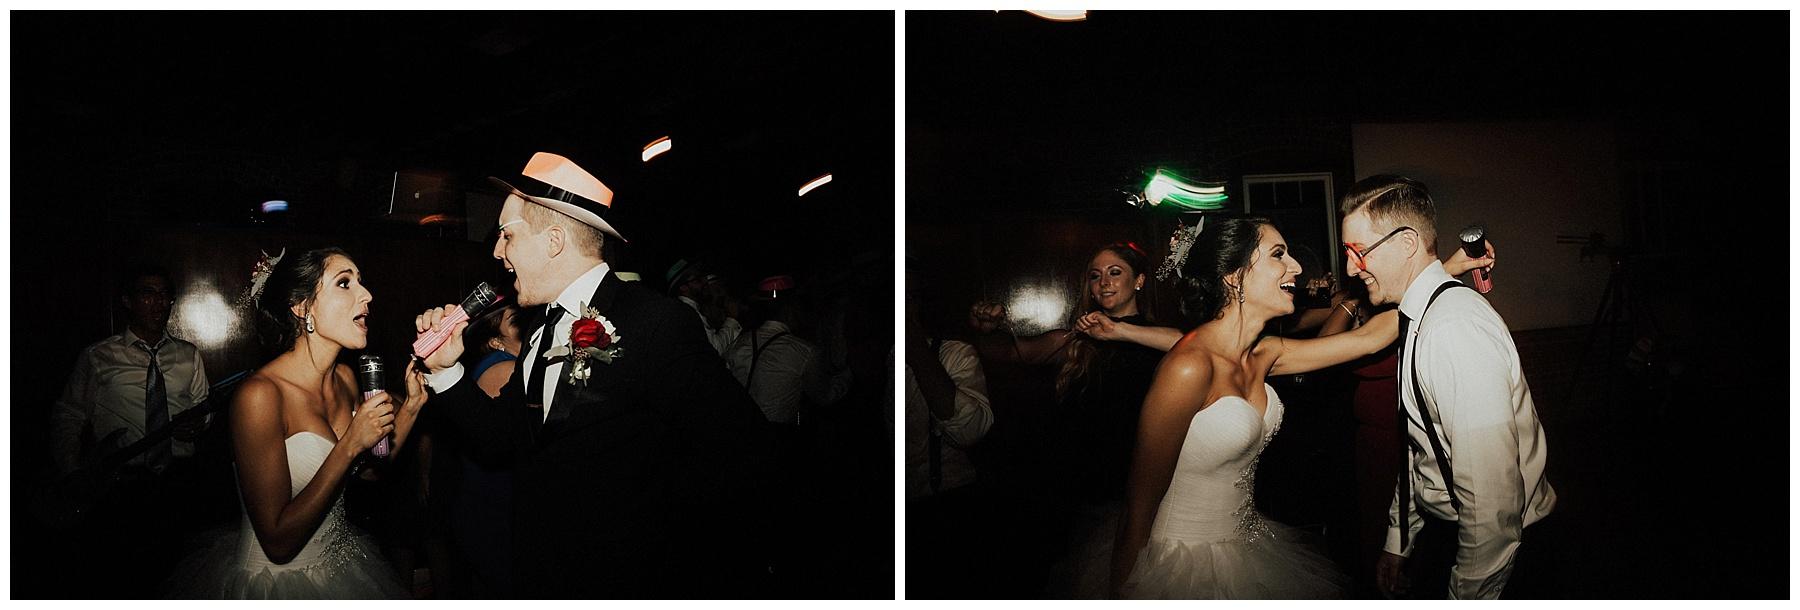 YBOR Wedding Tampa Wedding Photographer-123.jpg